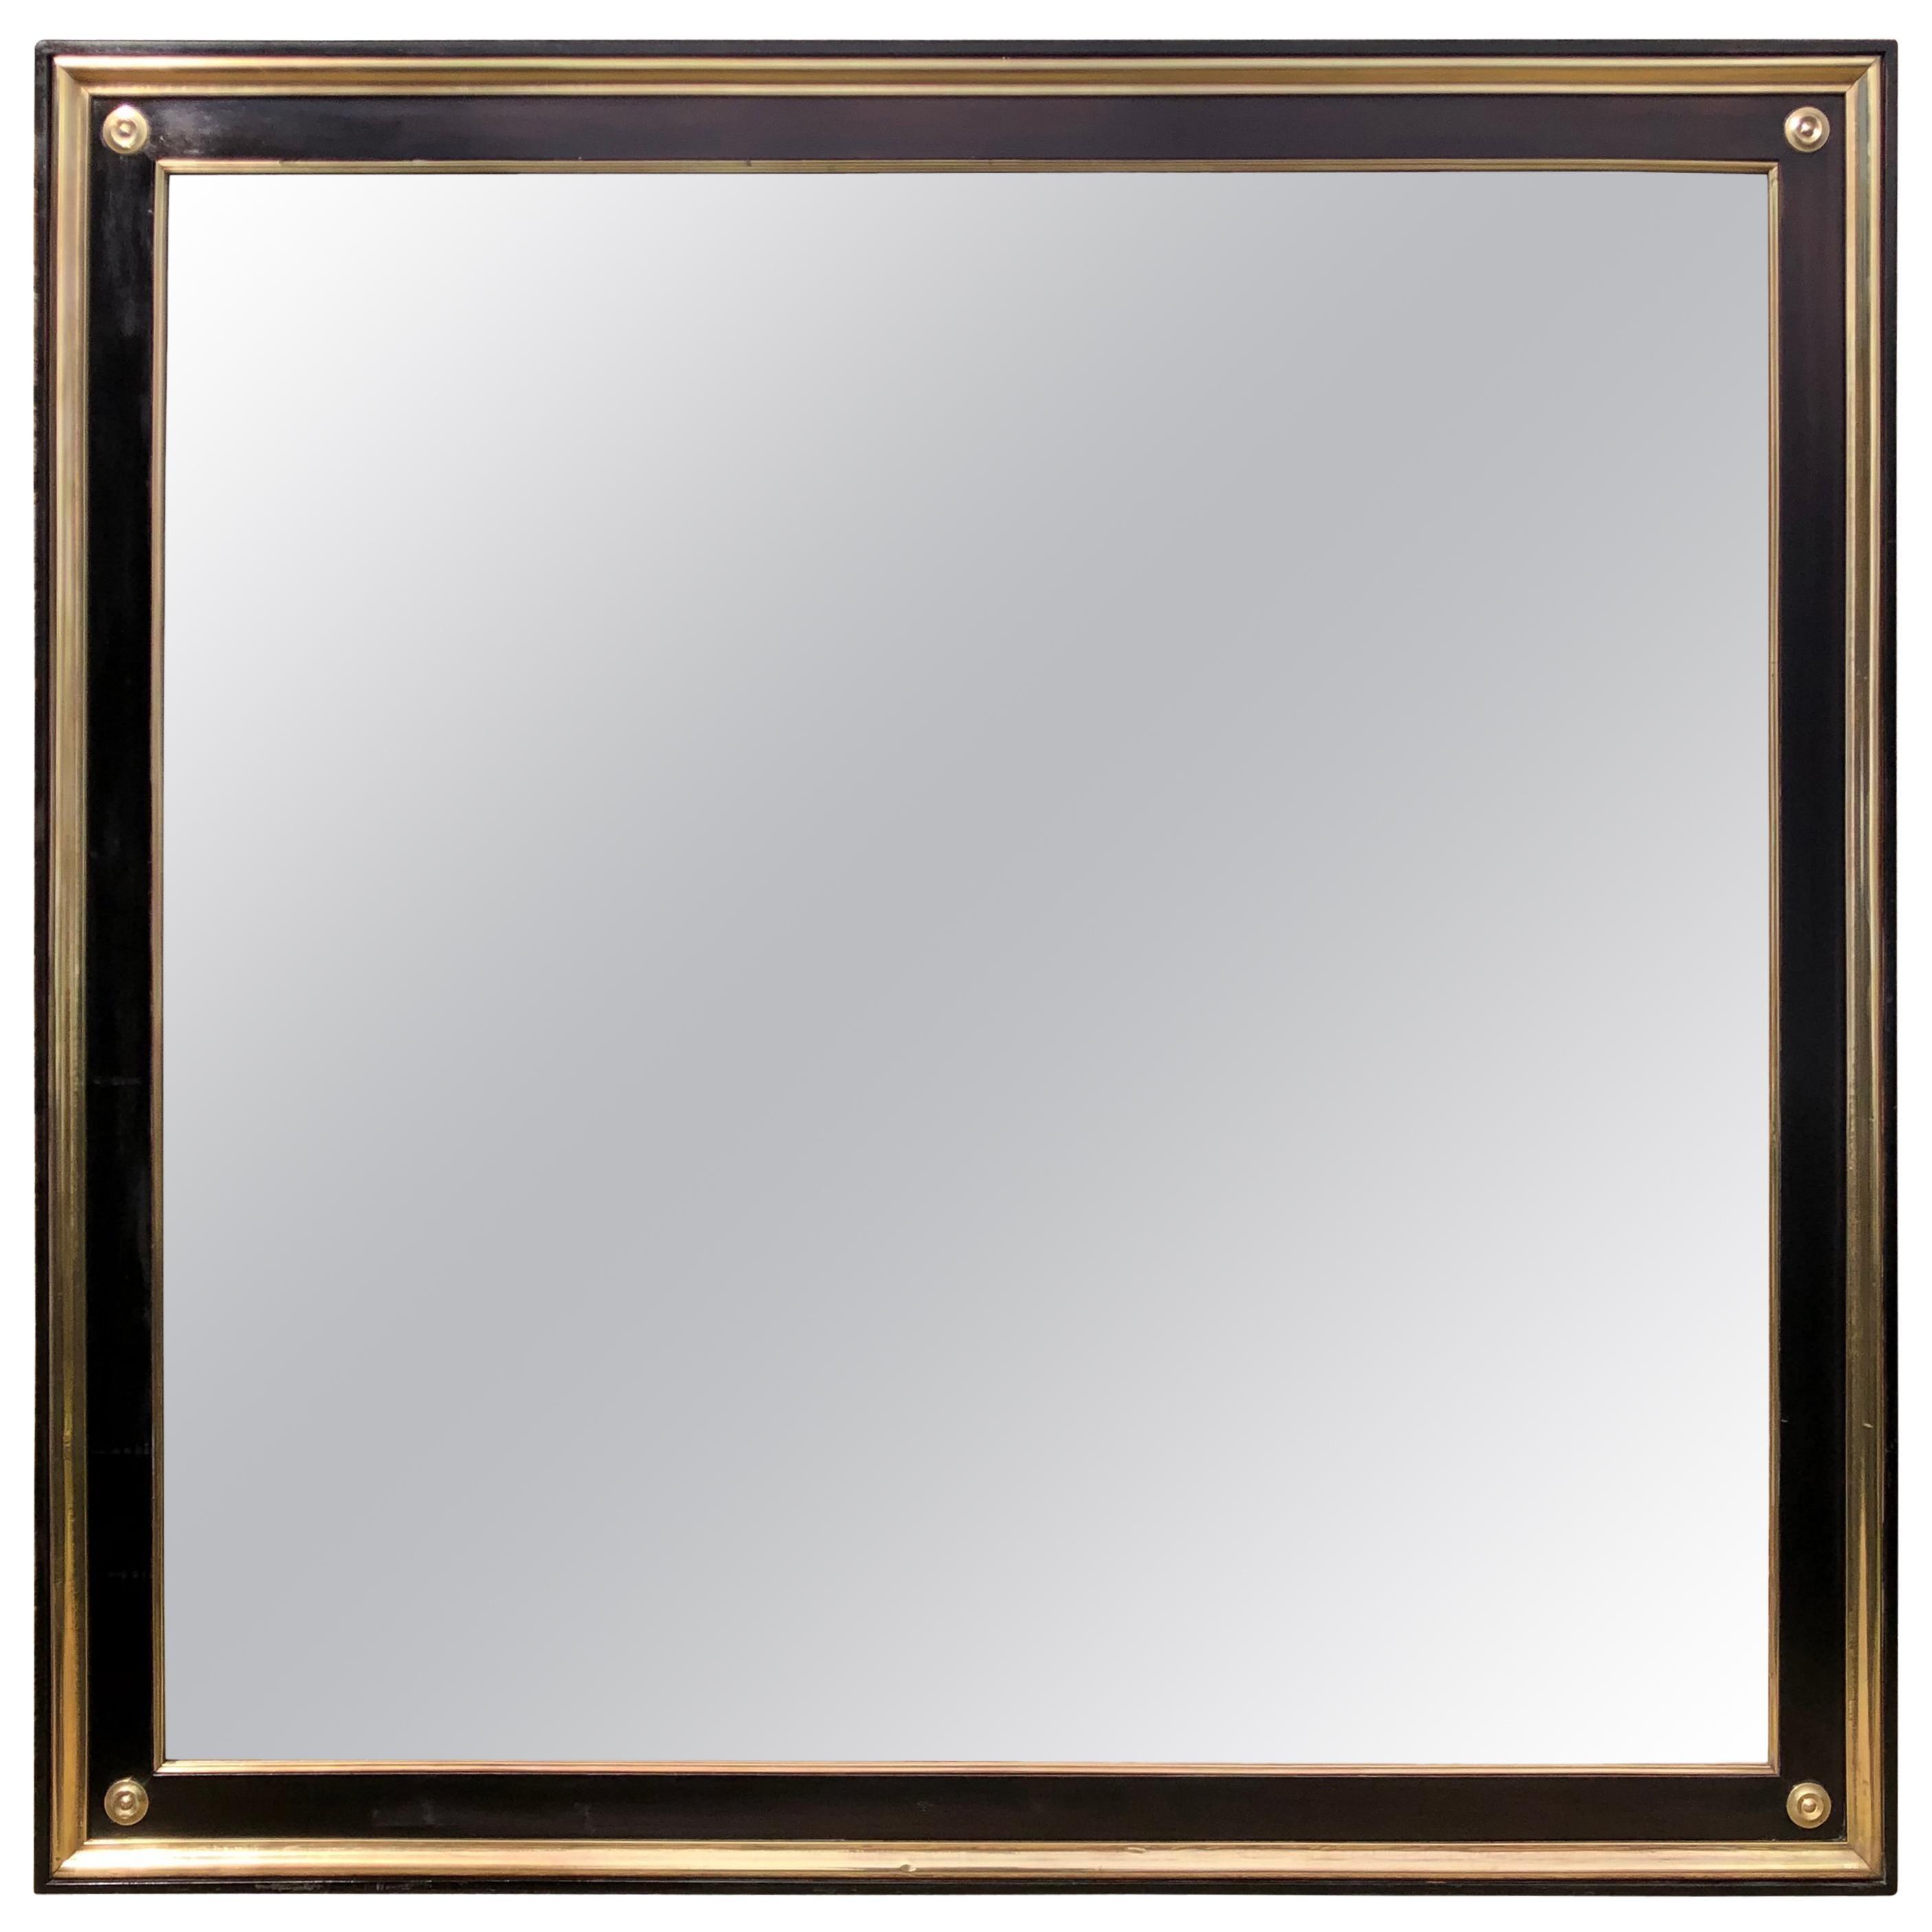 Large Maison Jansen Wood and Bronze Mirror